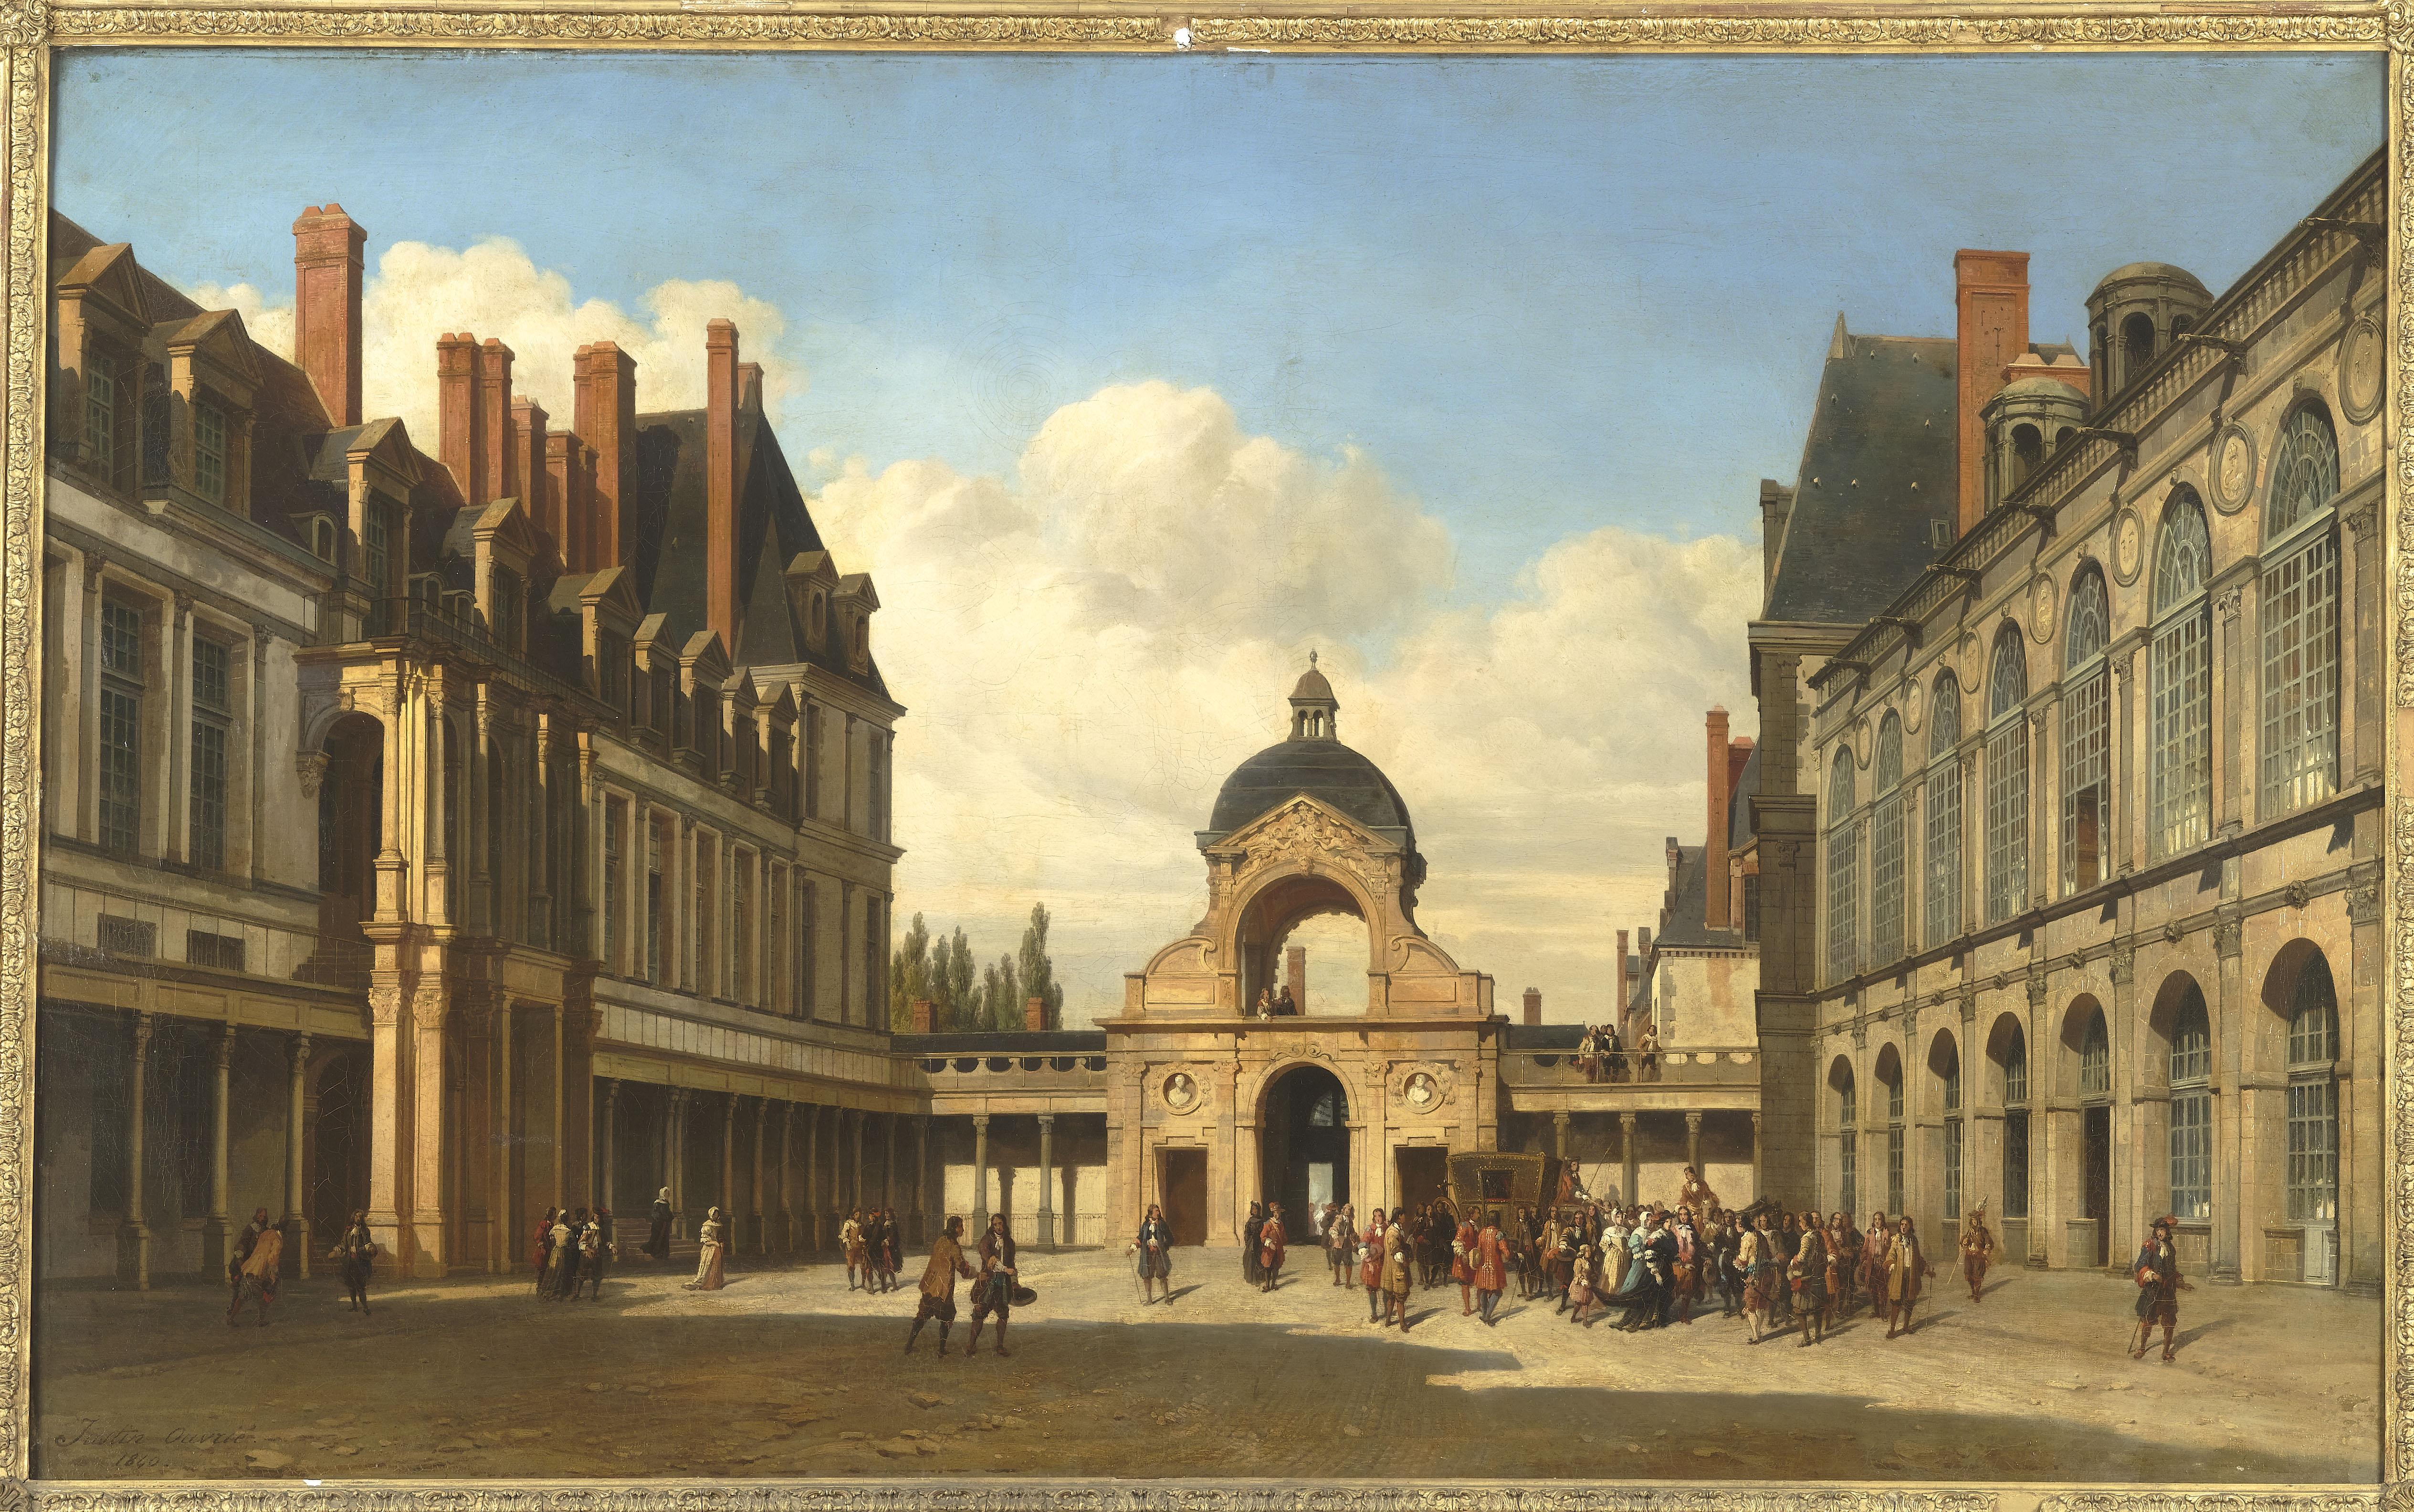 The Oval Courtyard - château de Fontainebleau - © RMN Grand Palais